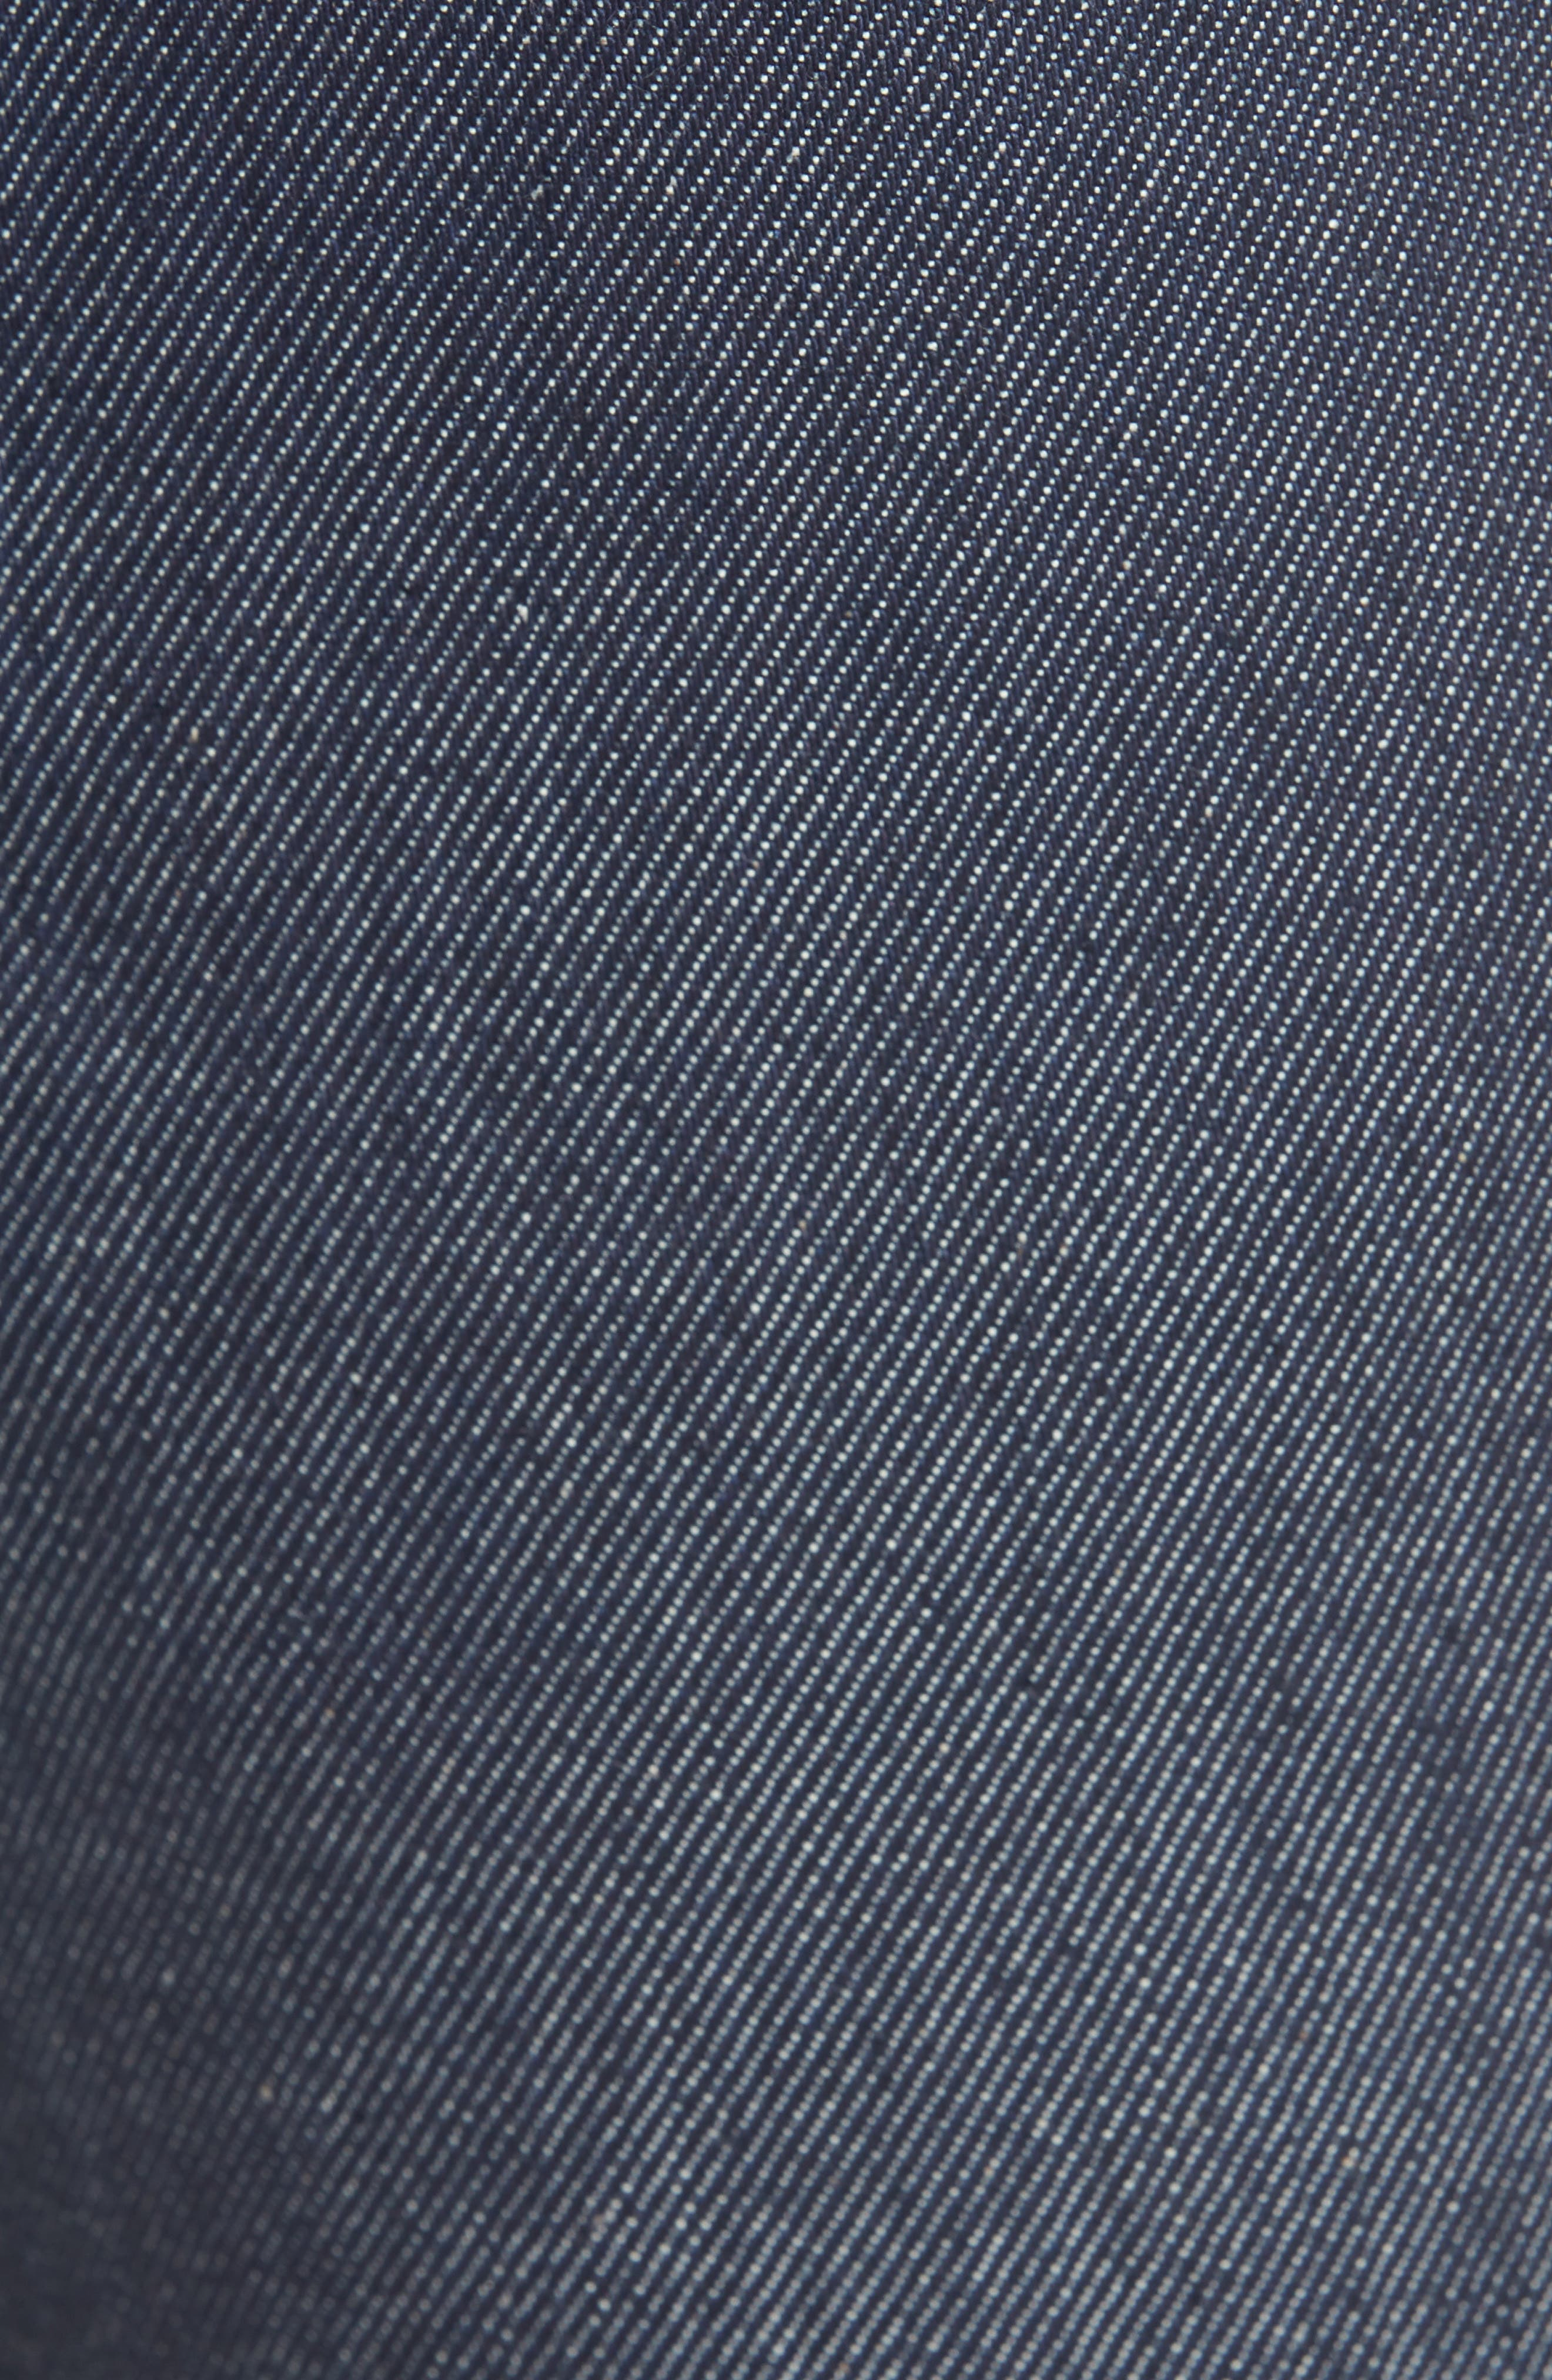 Max Slim Straight Leg Jeans,                             Alternate thumbnail 5, color,                             MAX INDIGO